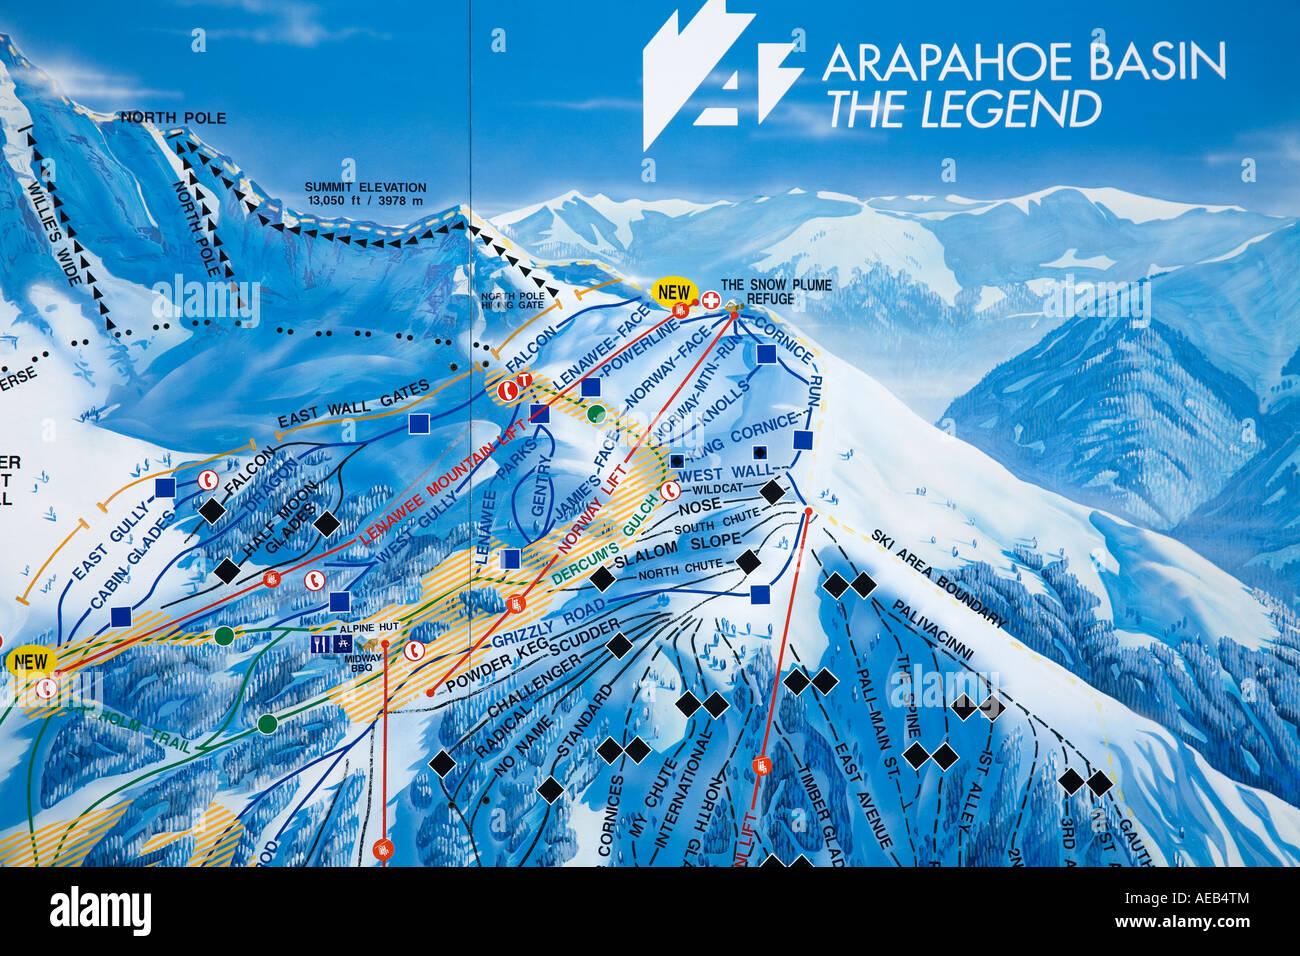 Map of Ski runs Arapahoe Basin Ski Resort Rocky Mountains Colorado Ski Resorts In Usa Map on locations of ski resorts map usa, map of utah ski resorts, map ski centers in usa, map ski resorts in france,